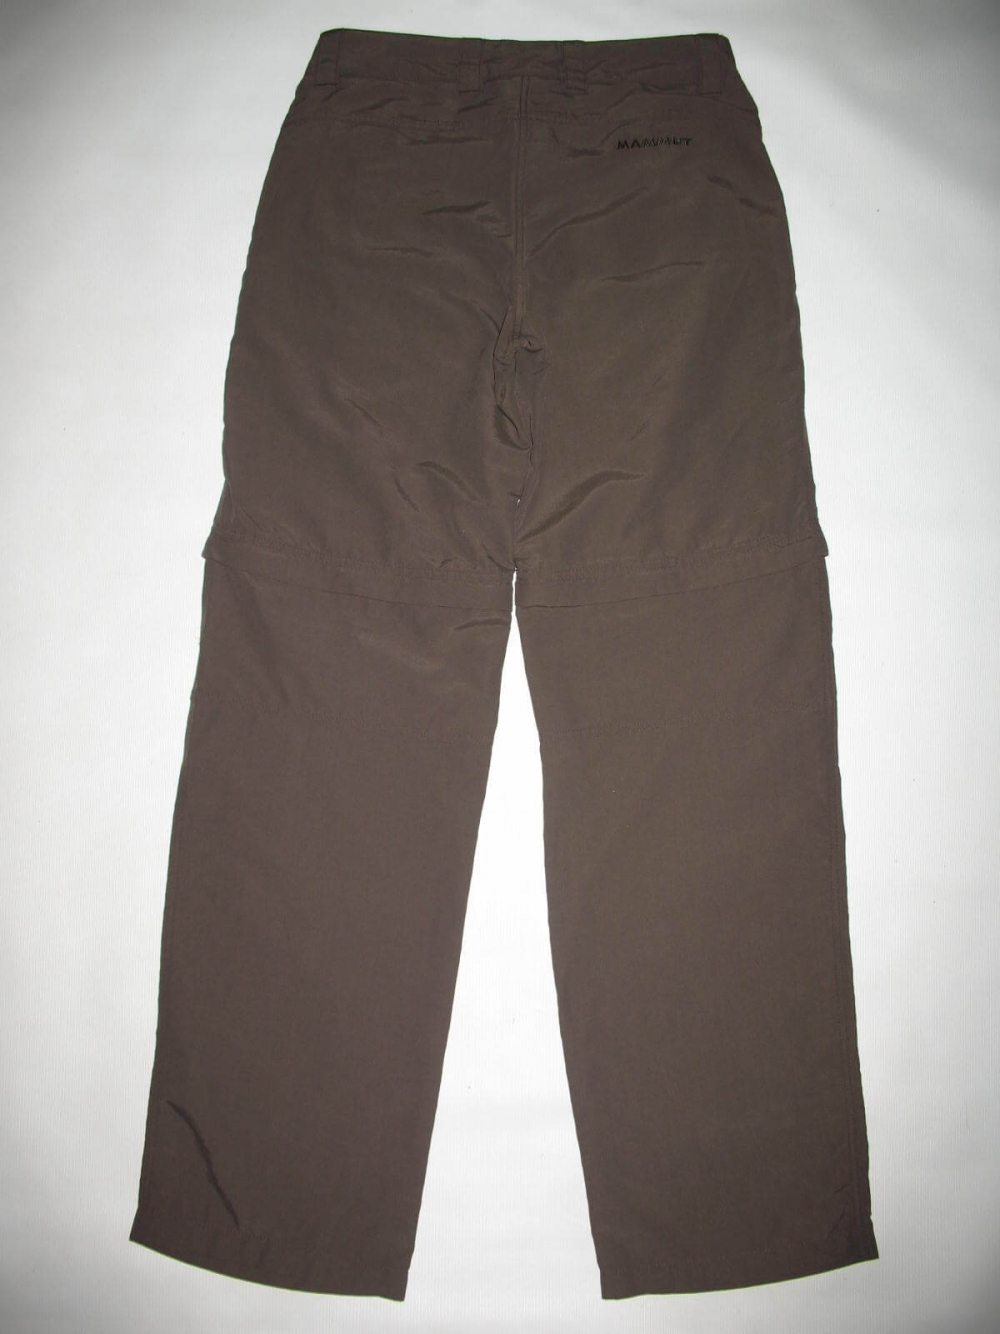 Штаны MAMMUT Zip Off brown pants lady (размер S/XS) - 2